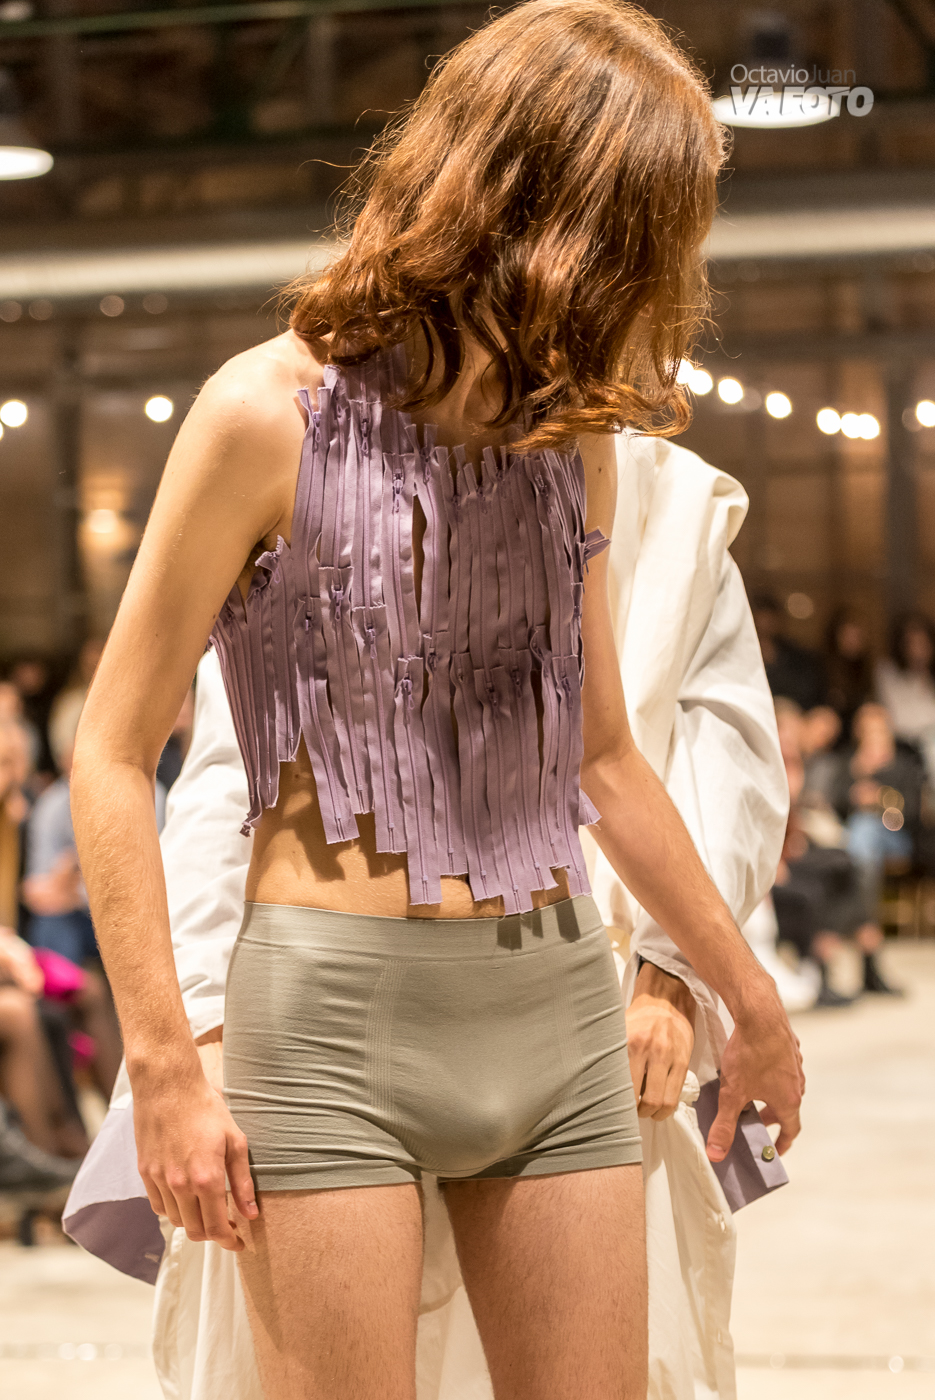 00194 ARTEMODA DSC4293 20181124 - Evento: Arte + Moda Valencia